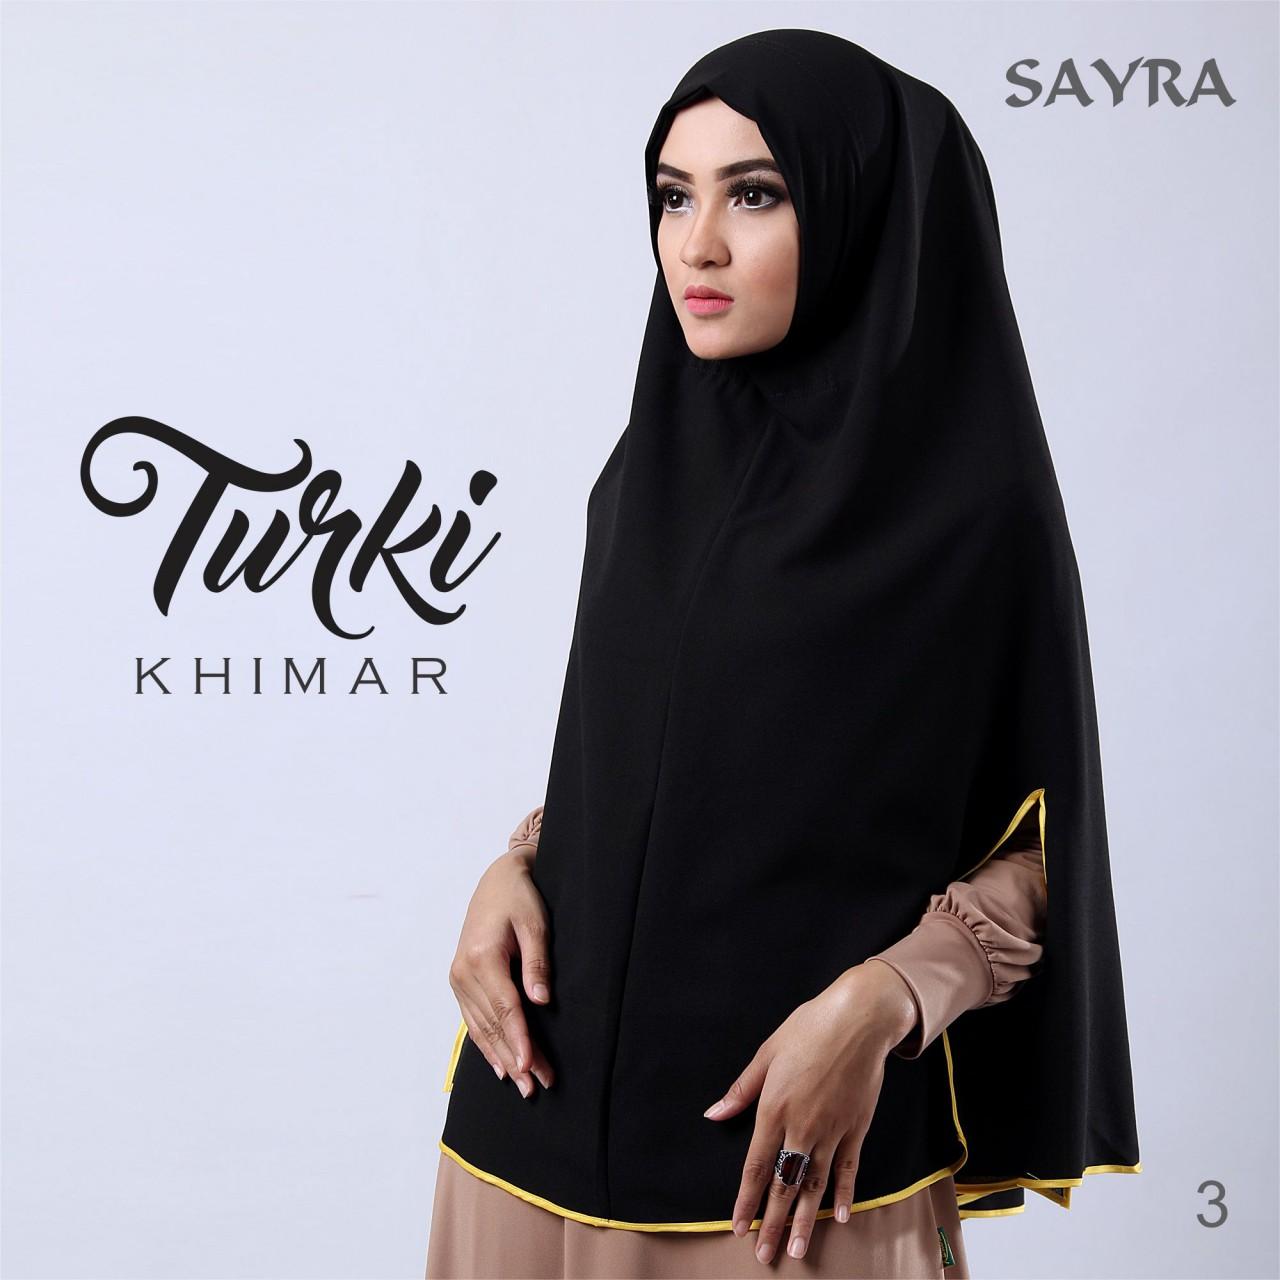 Khimar turki syari ori by sayra supplier jilbab branded Baju gamis almia terbaru